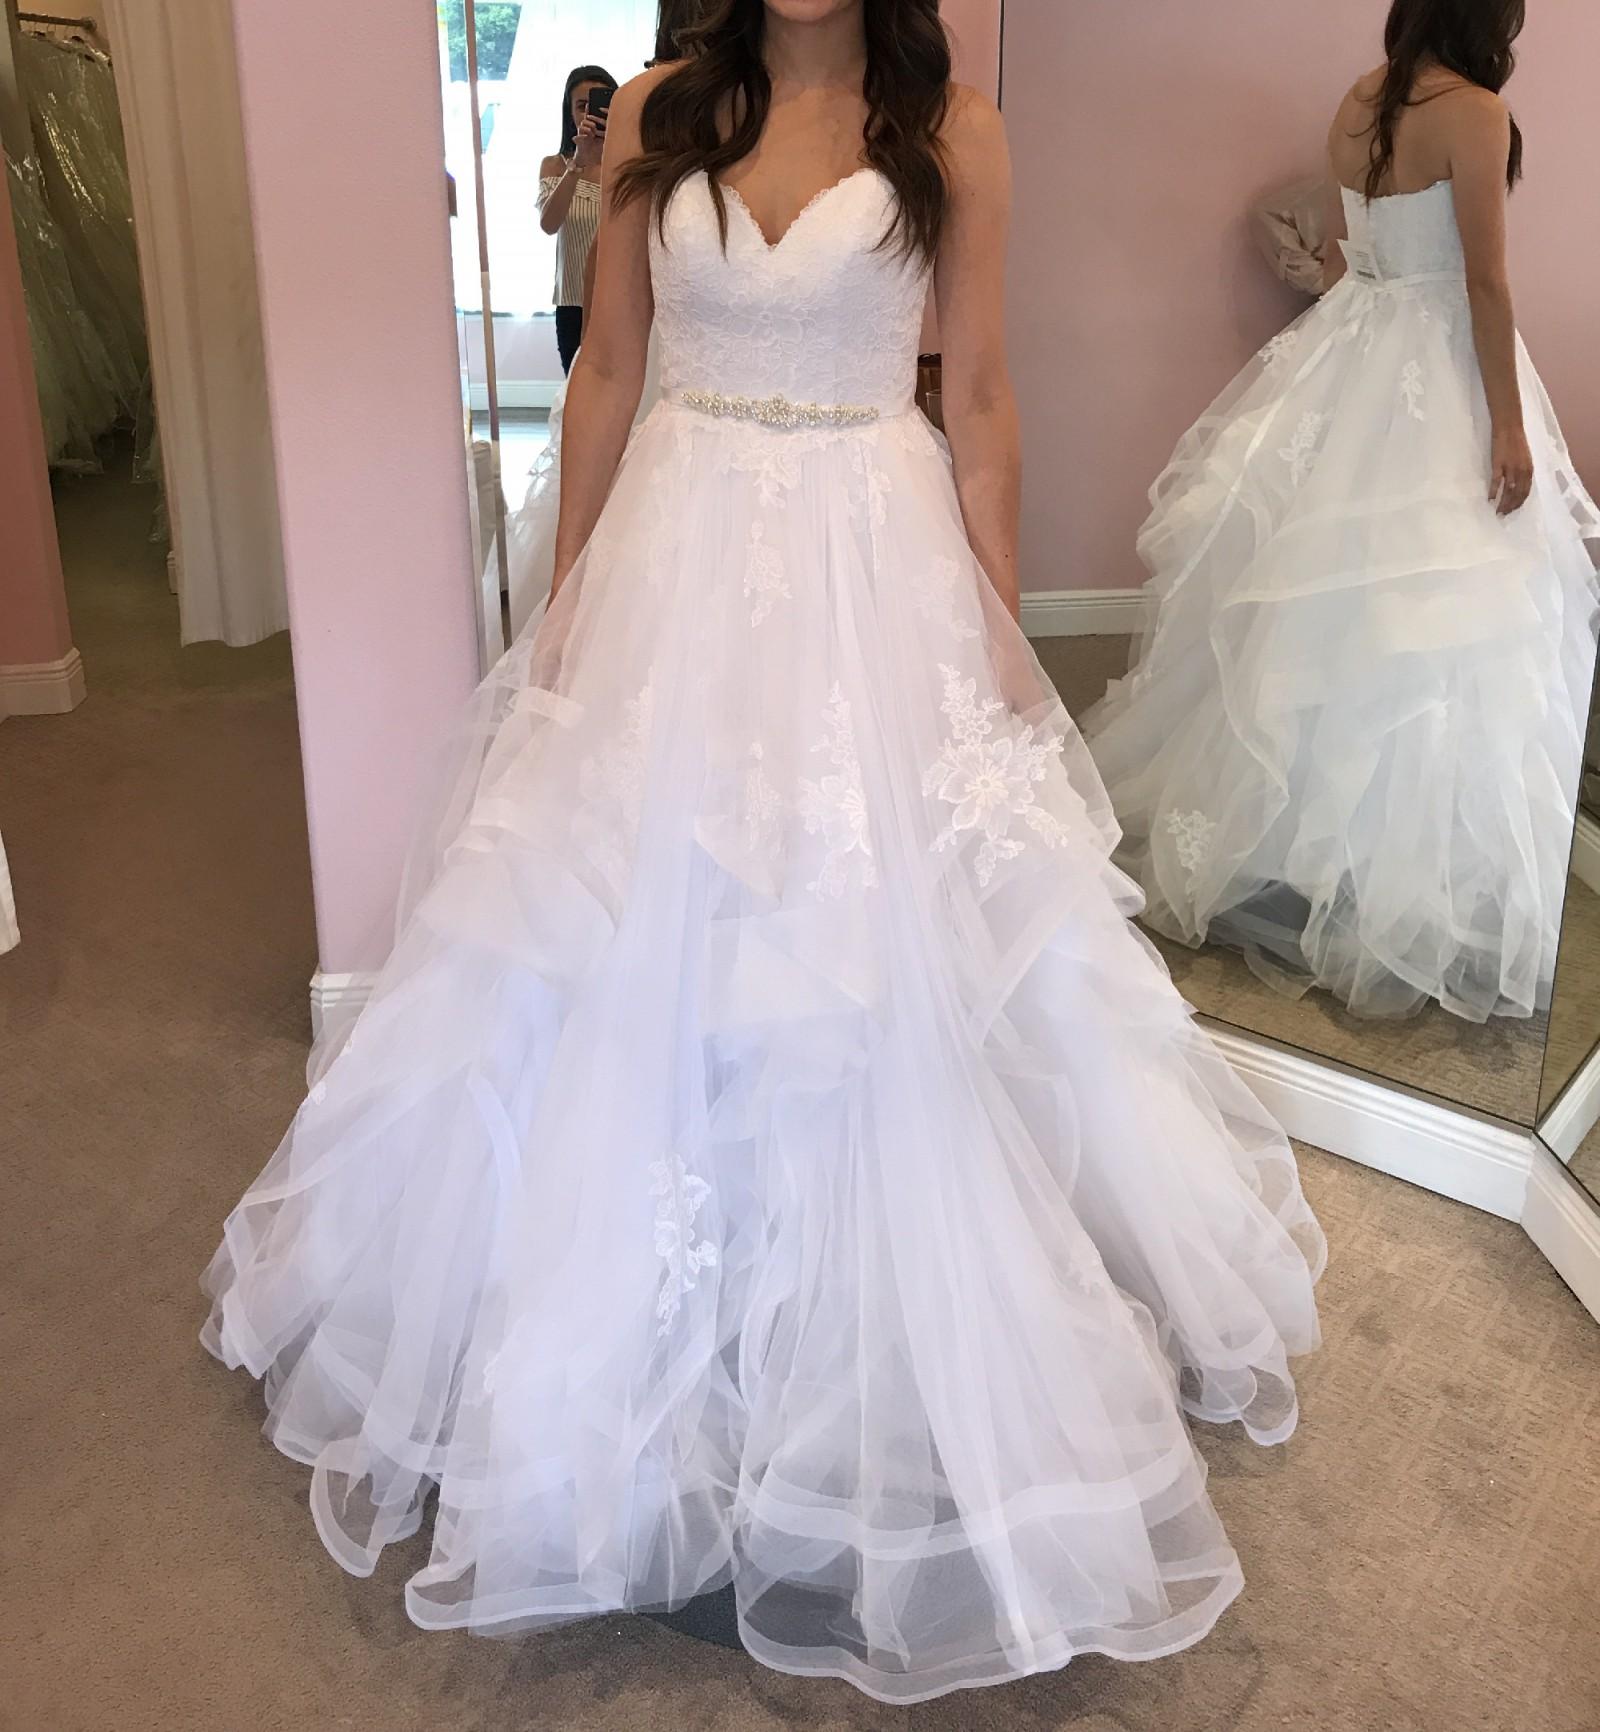 Stella York 6432 New Wedding Dress On Sale 40% Off